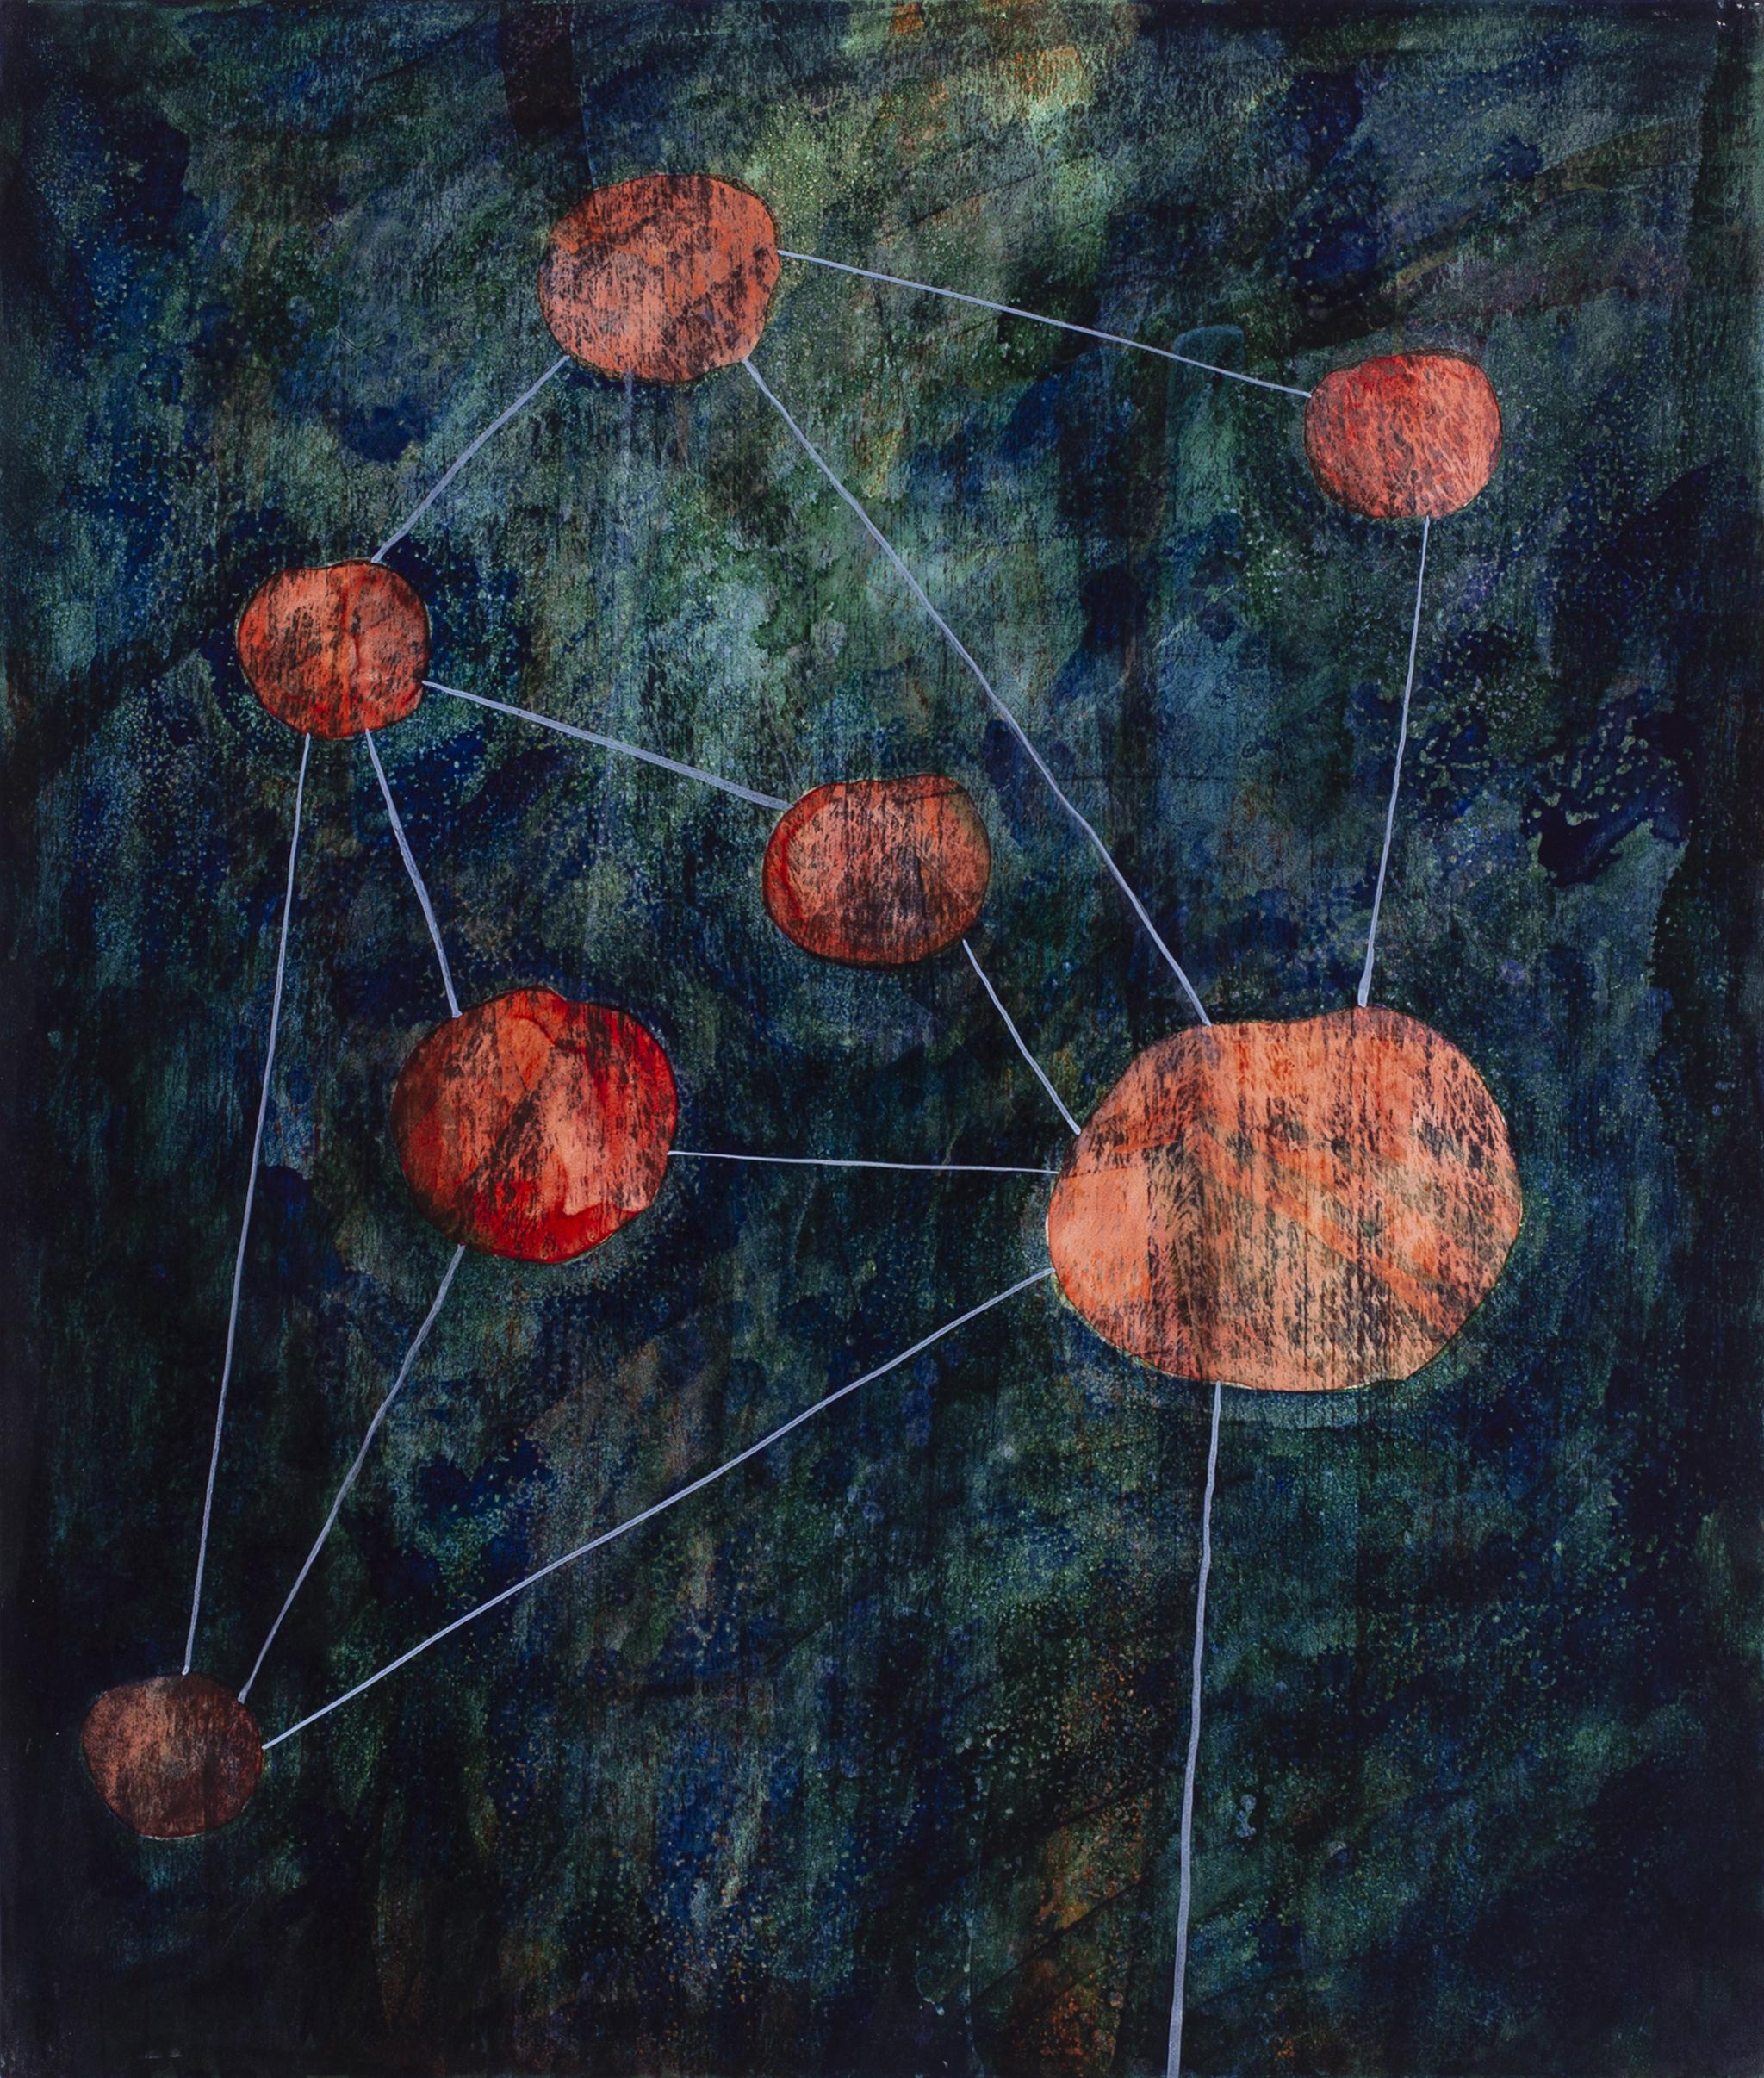 Tomato constellations